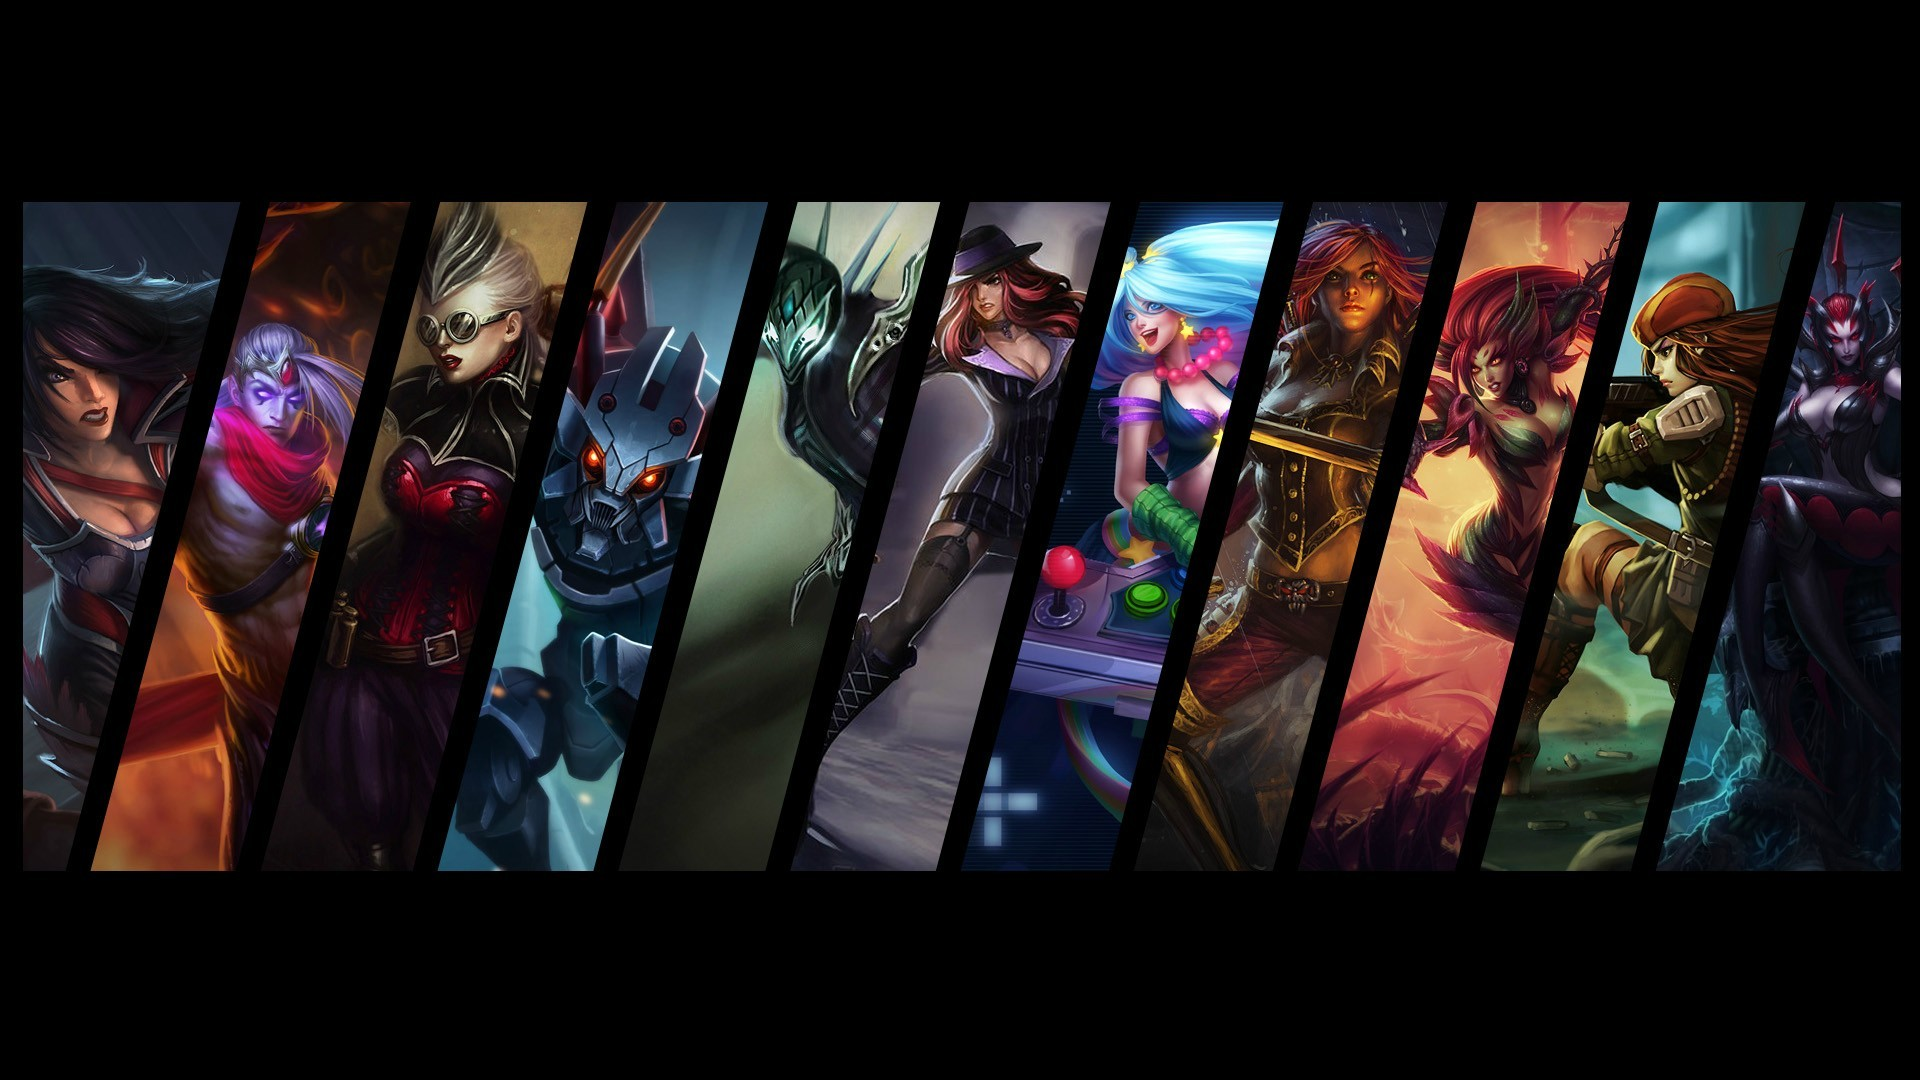 league of legends wallpapers lol desktop backgrounds - HD1920×1080